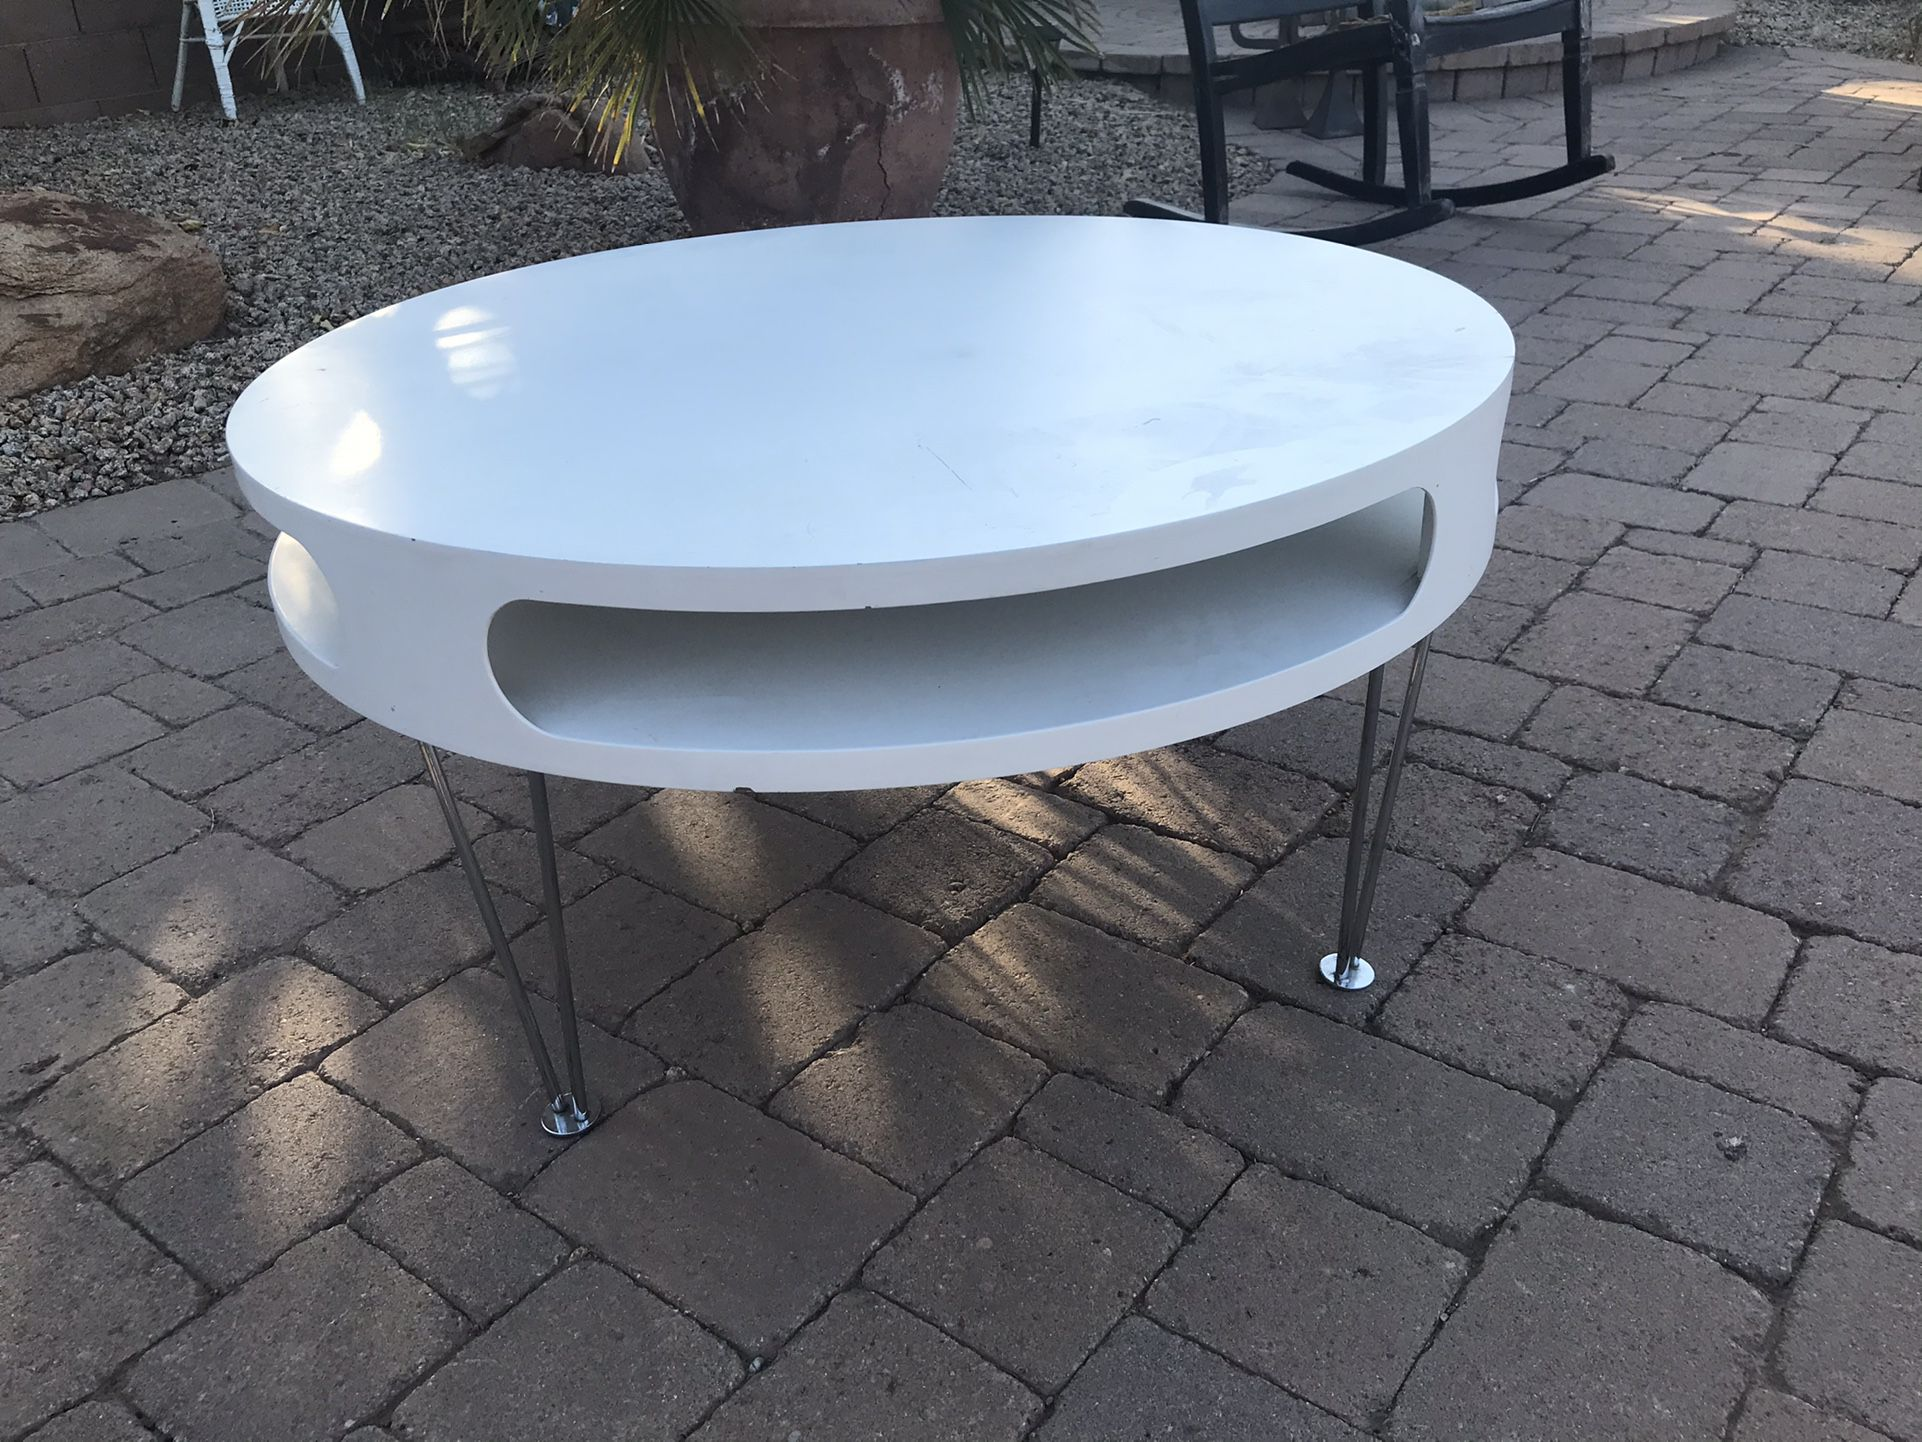 Hairpin Leg Round Coffee Table W/futuristic Openings 7th St/Thunderbird